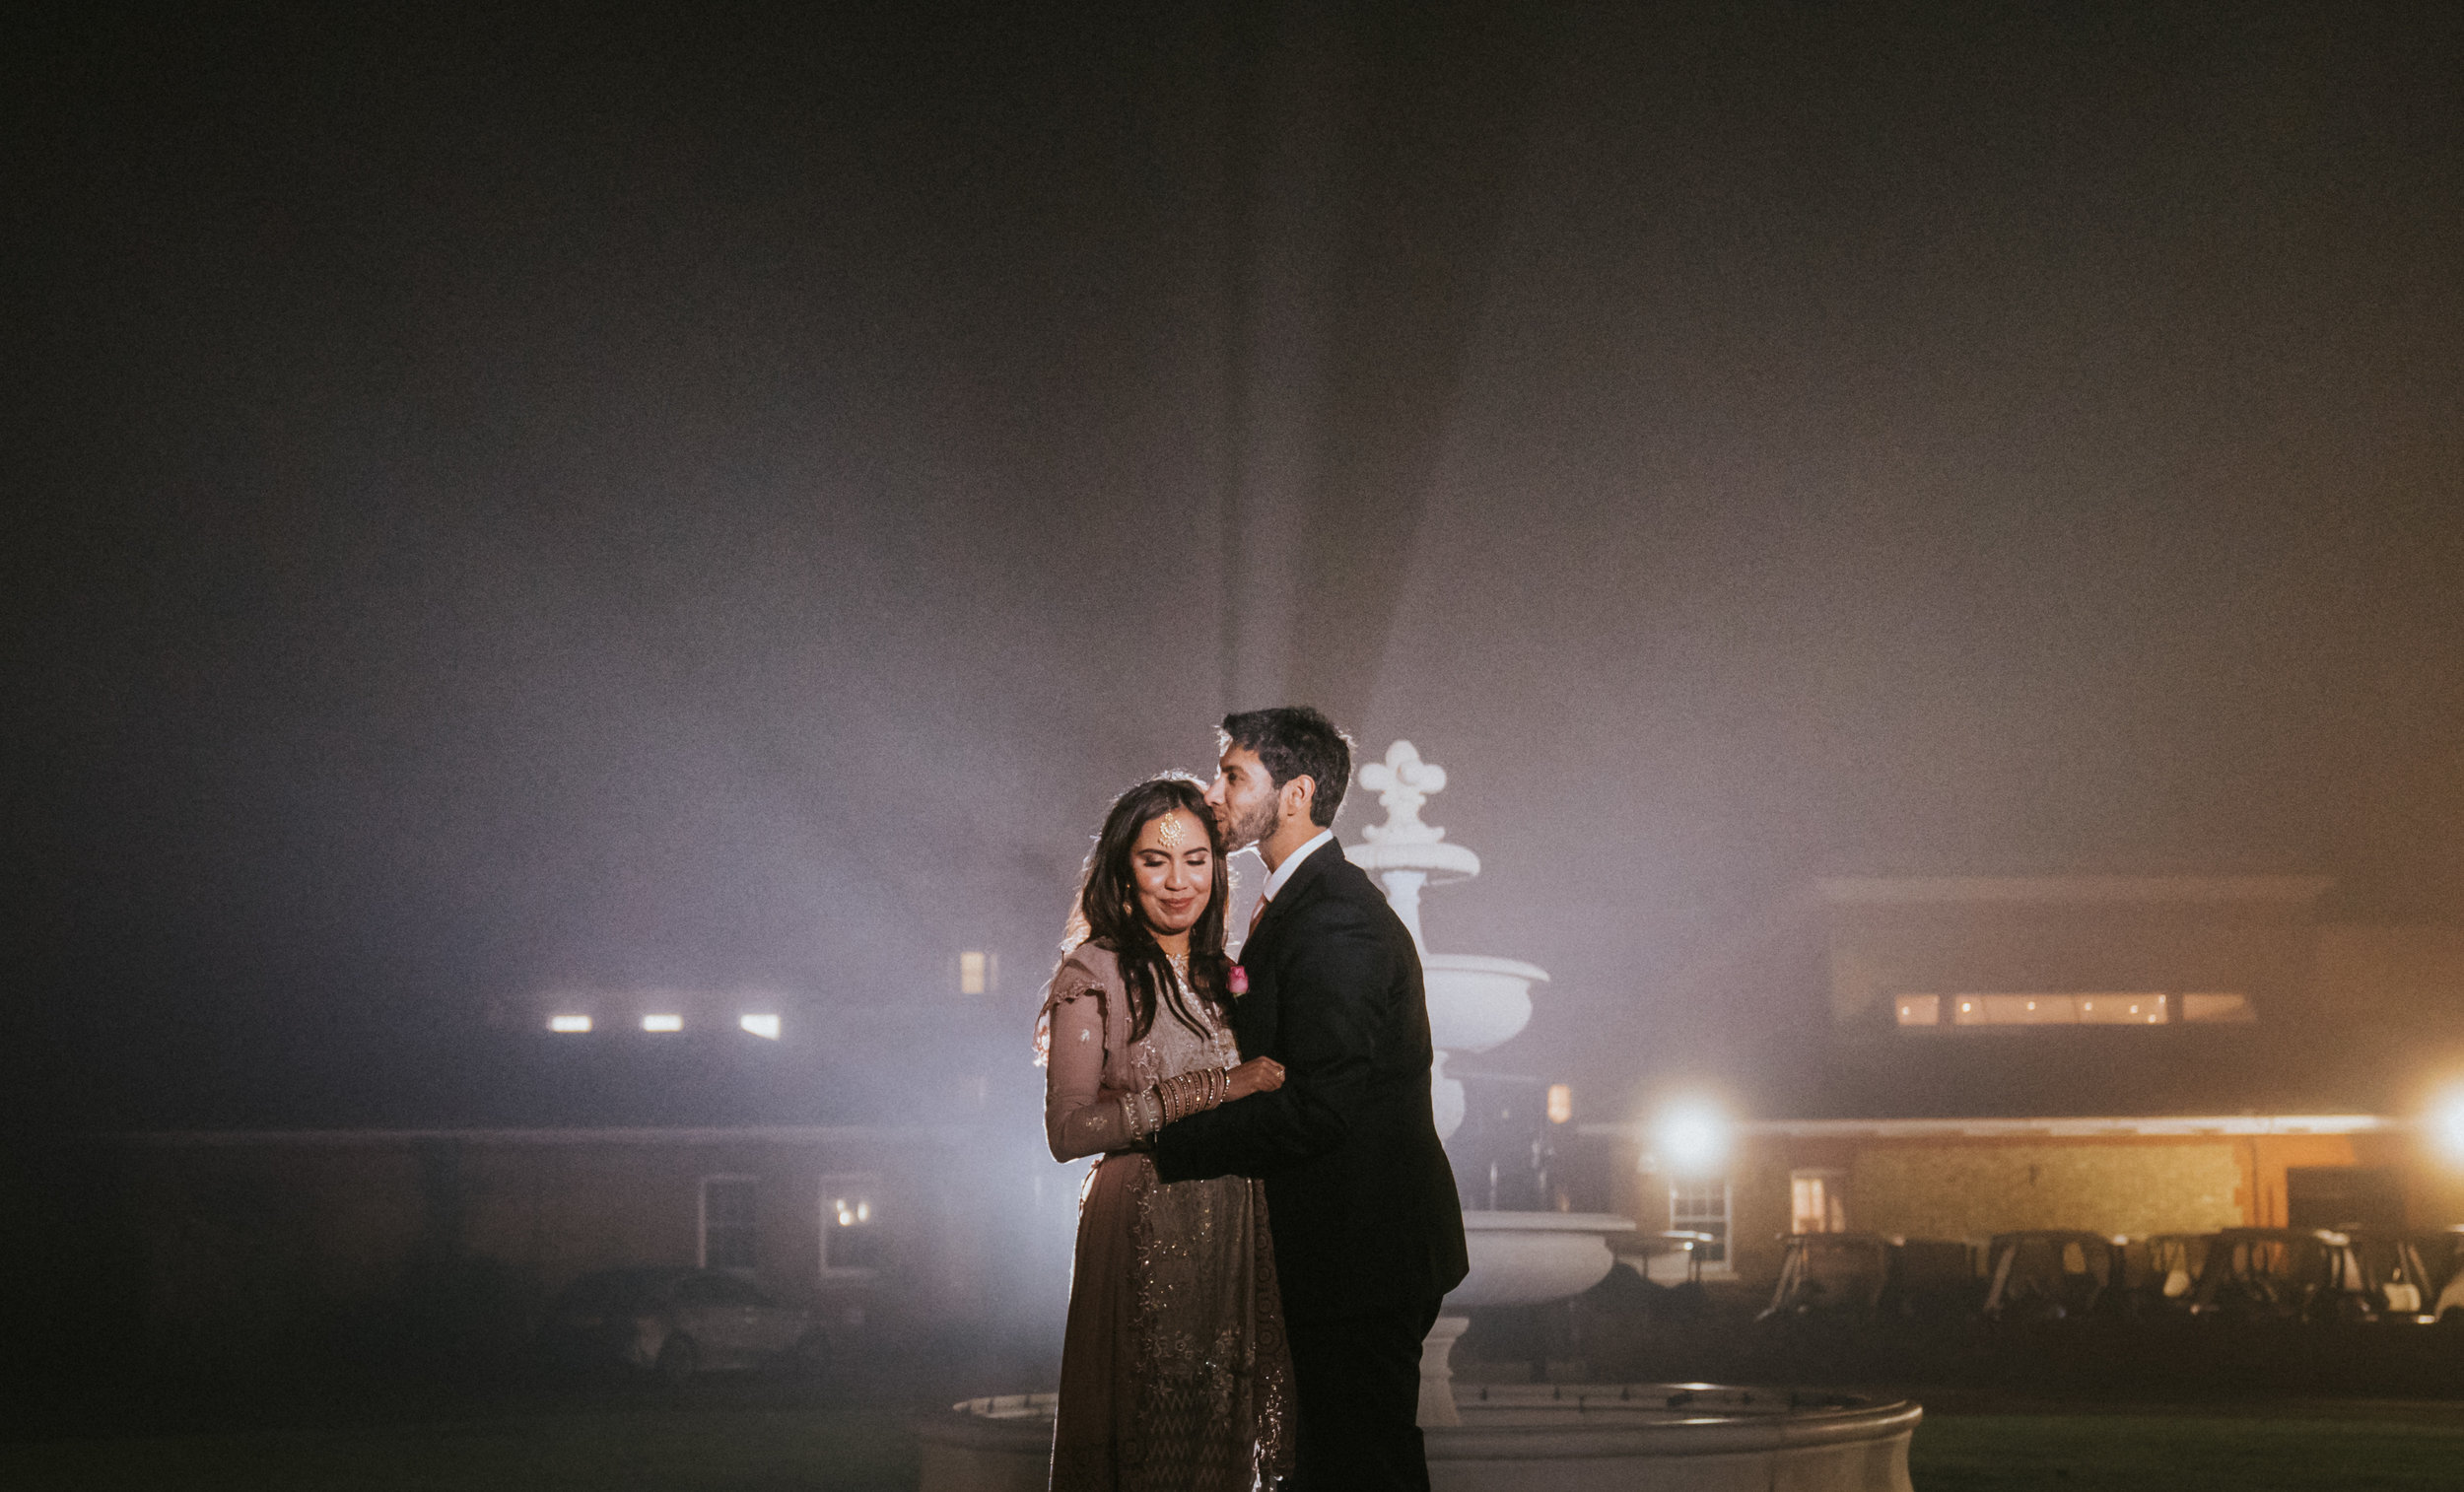 buckinghamshire-golf-club-winter-muslim-wedding-engagement-photography-videography-75